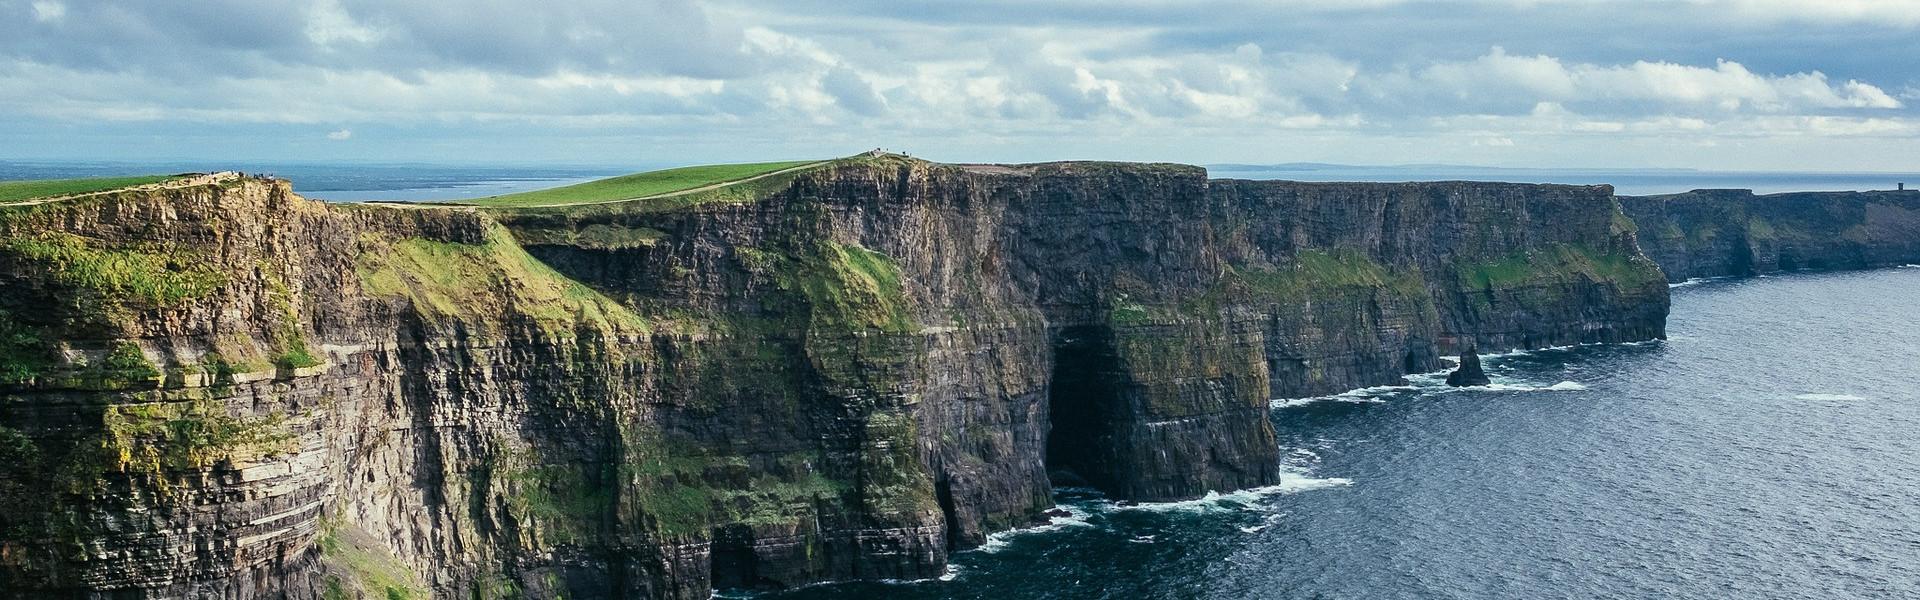 Destination image of Ireland